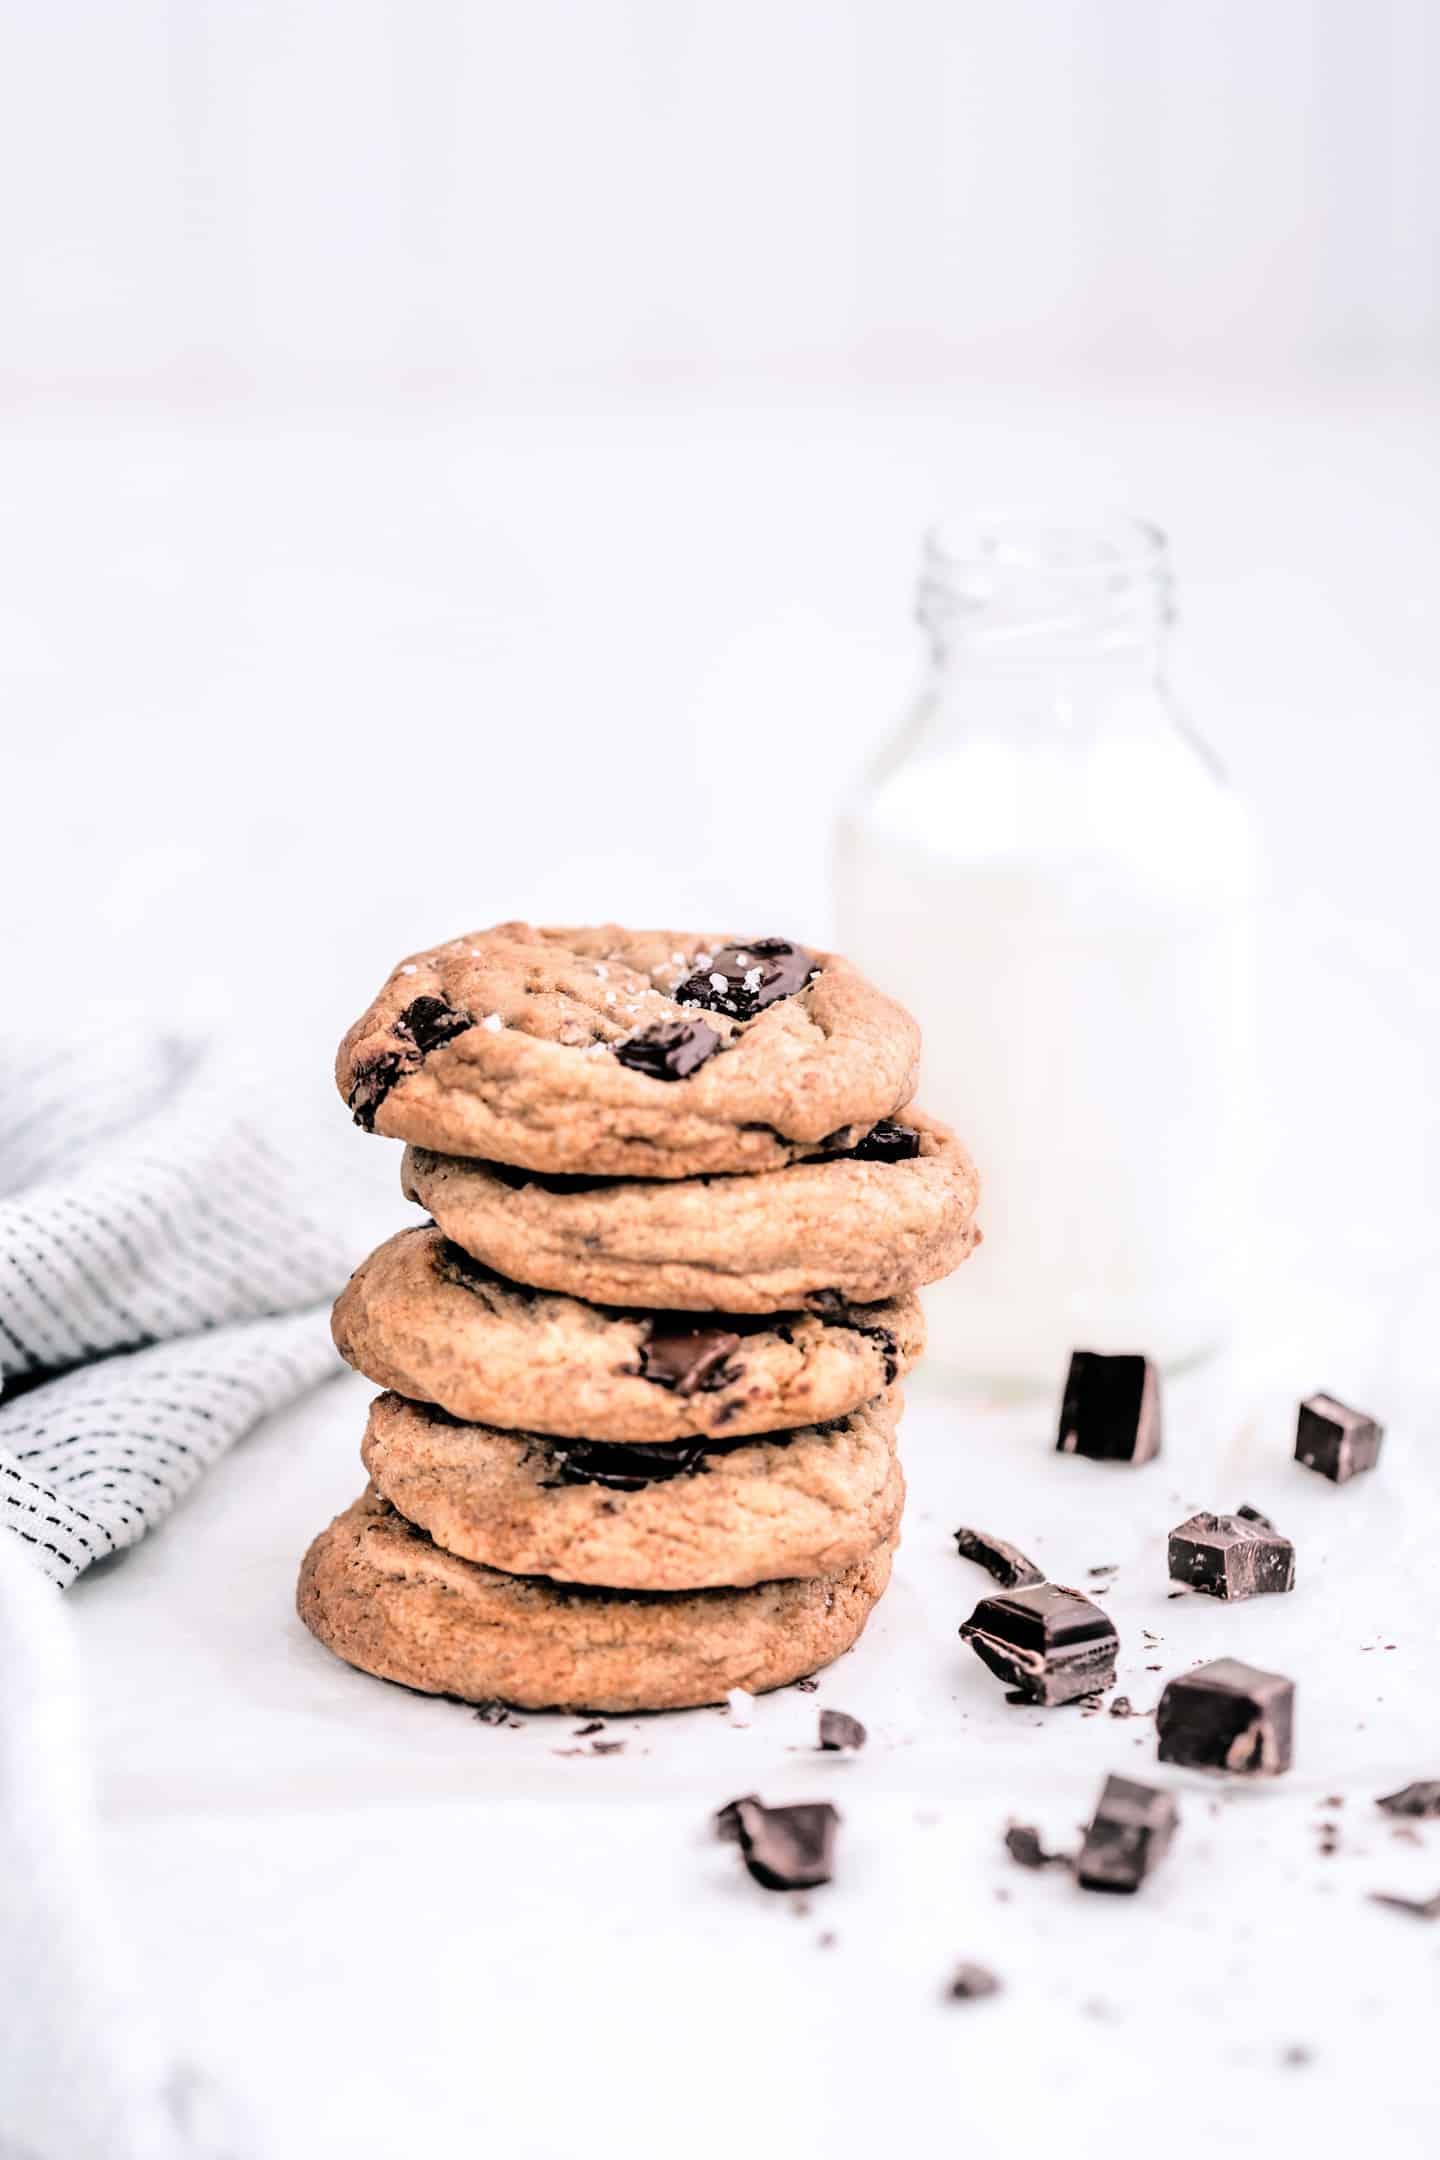 Chocolate chip cookies la recette